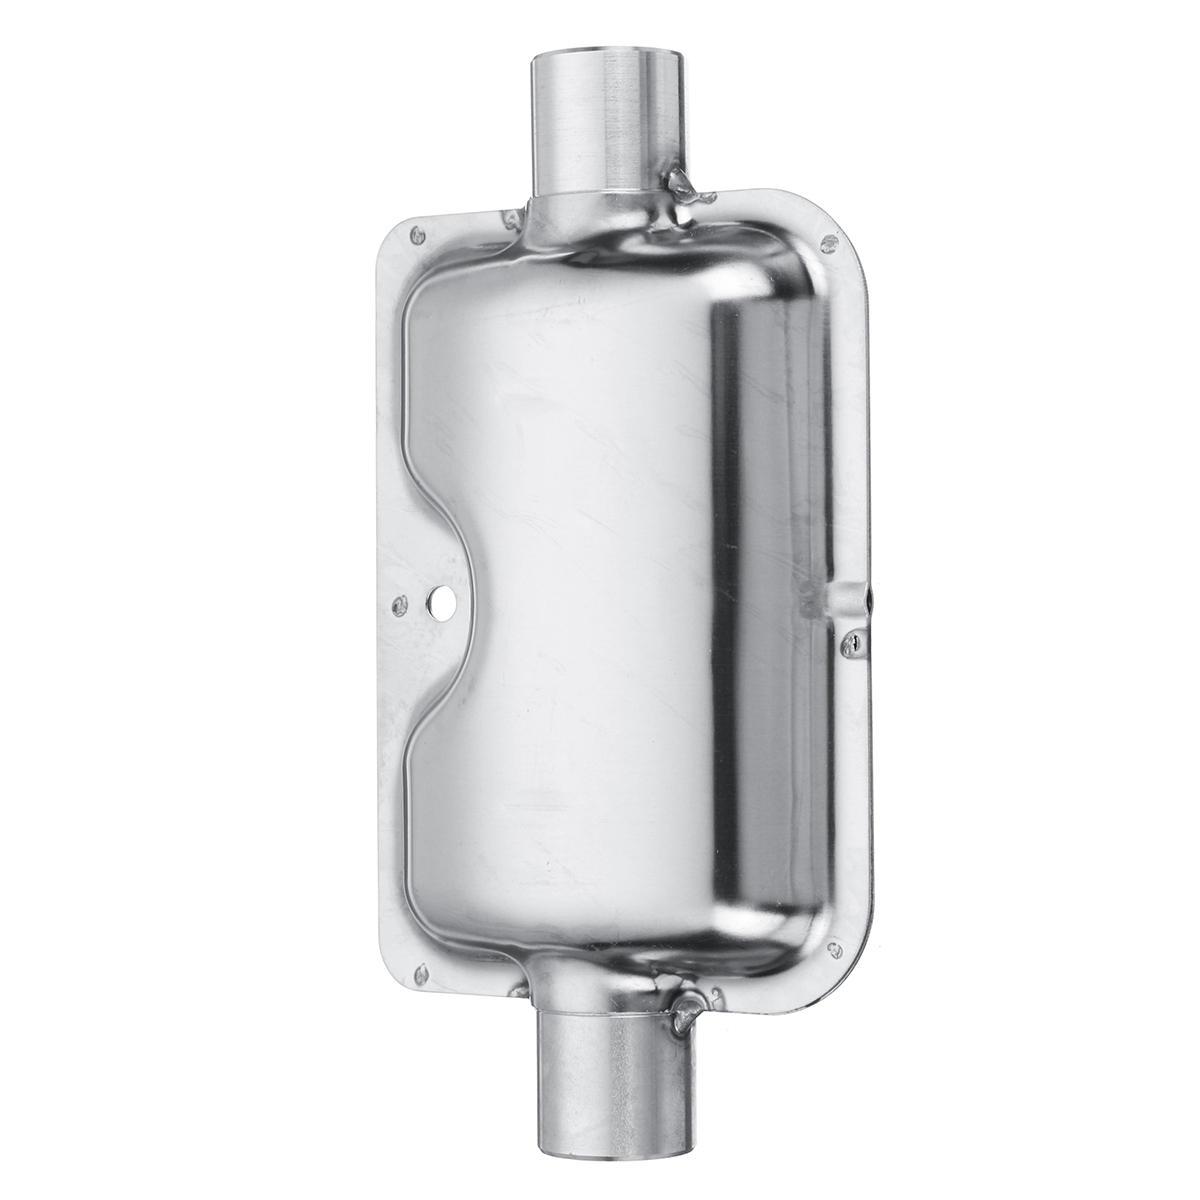 24mm Pipe Silencer Exhaust Muffler Clamps Bracket For Ebespacher Diesel Heater